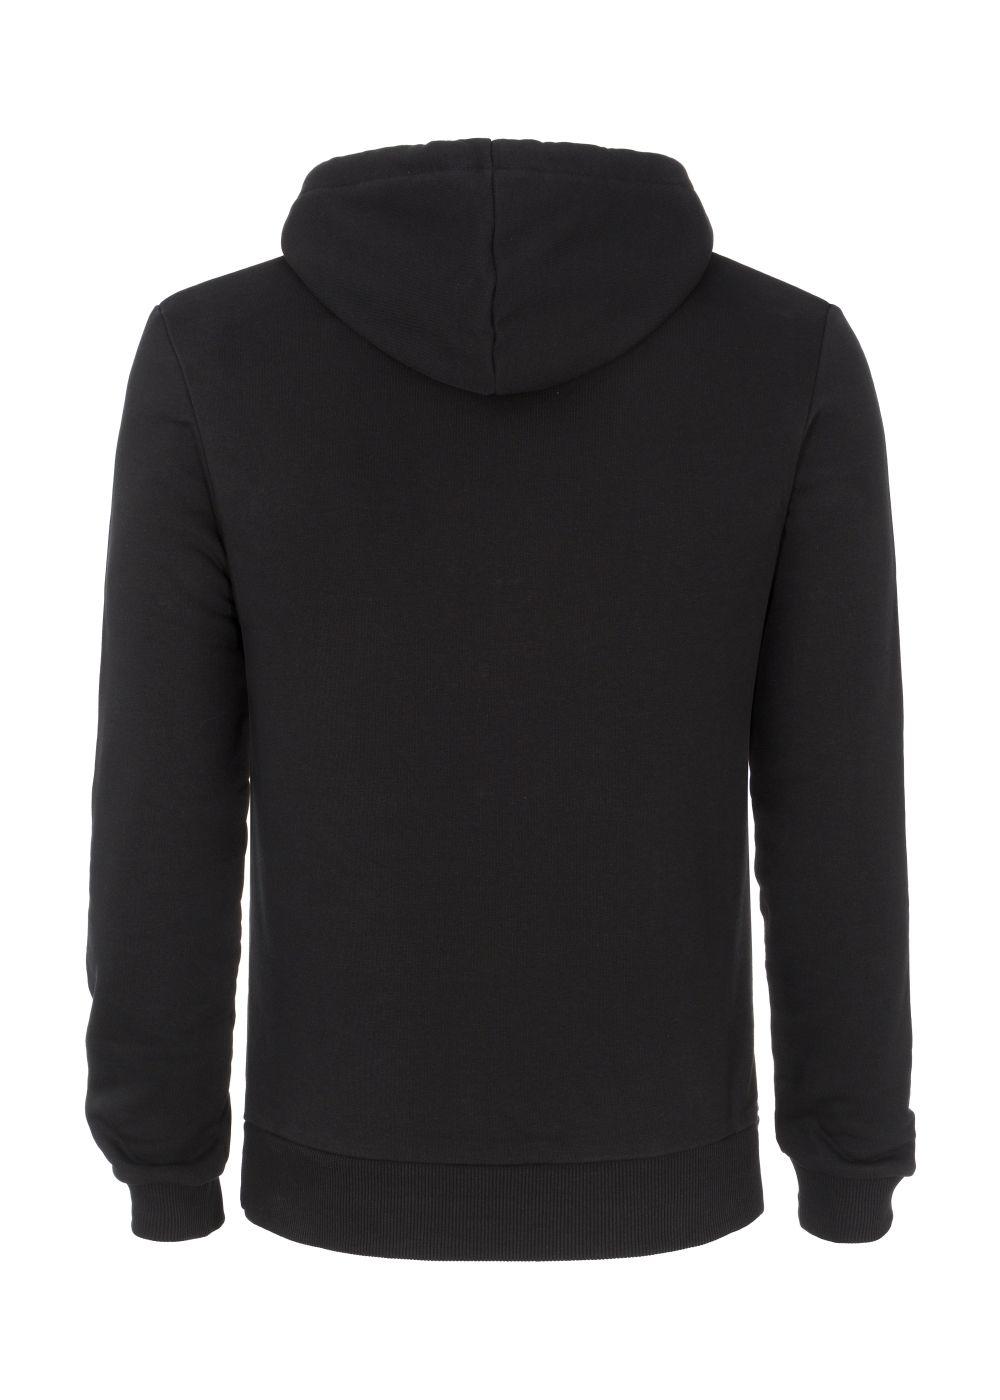 Bluza męska BLZMT-0023-99(Z20)